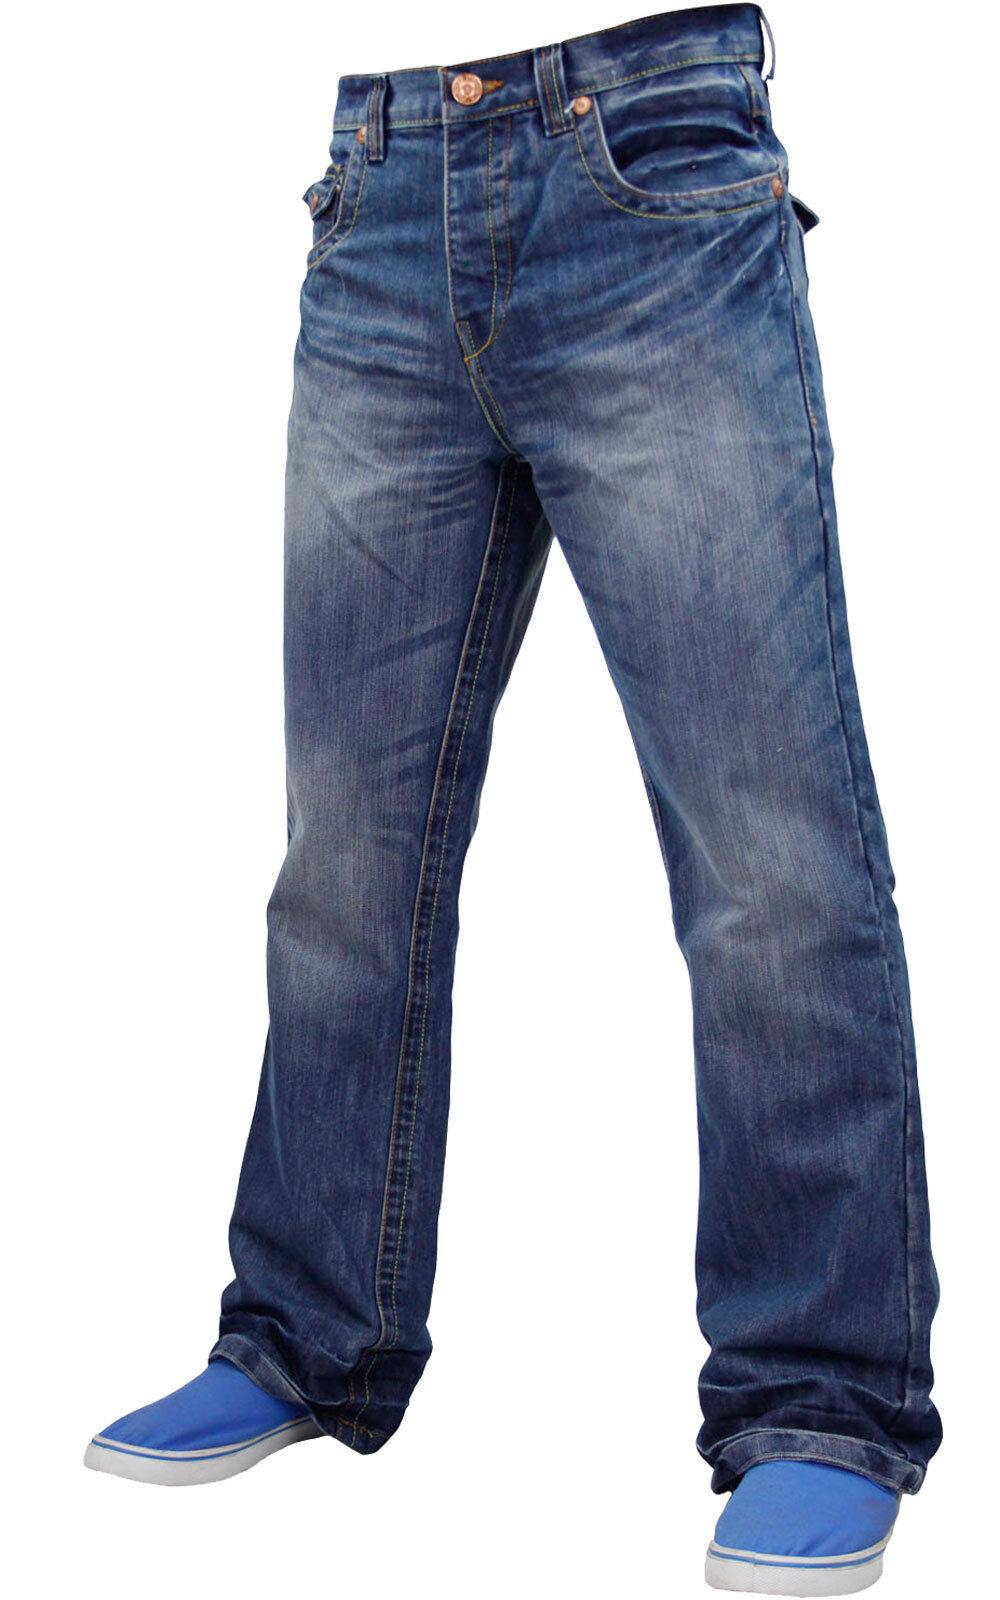 Mens Boys APT Designer Boot Cut Denim Jeans Trousers Light ... - photo#20